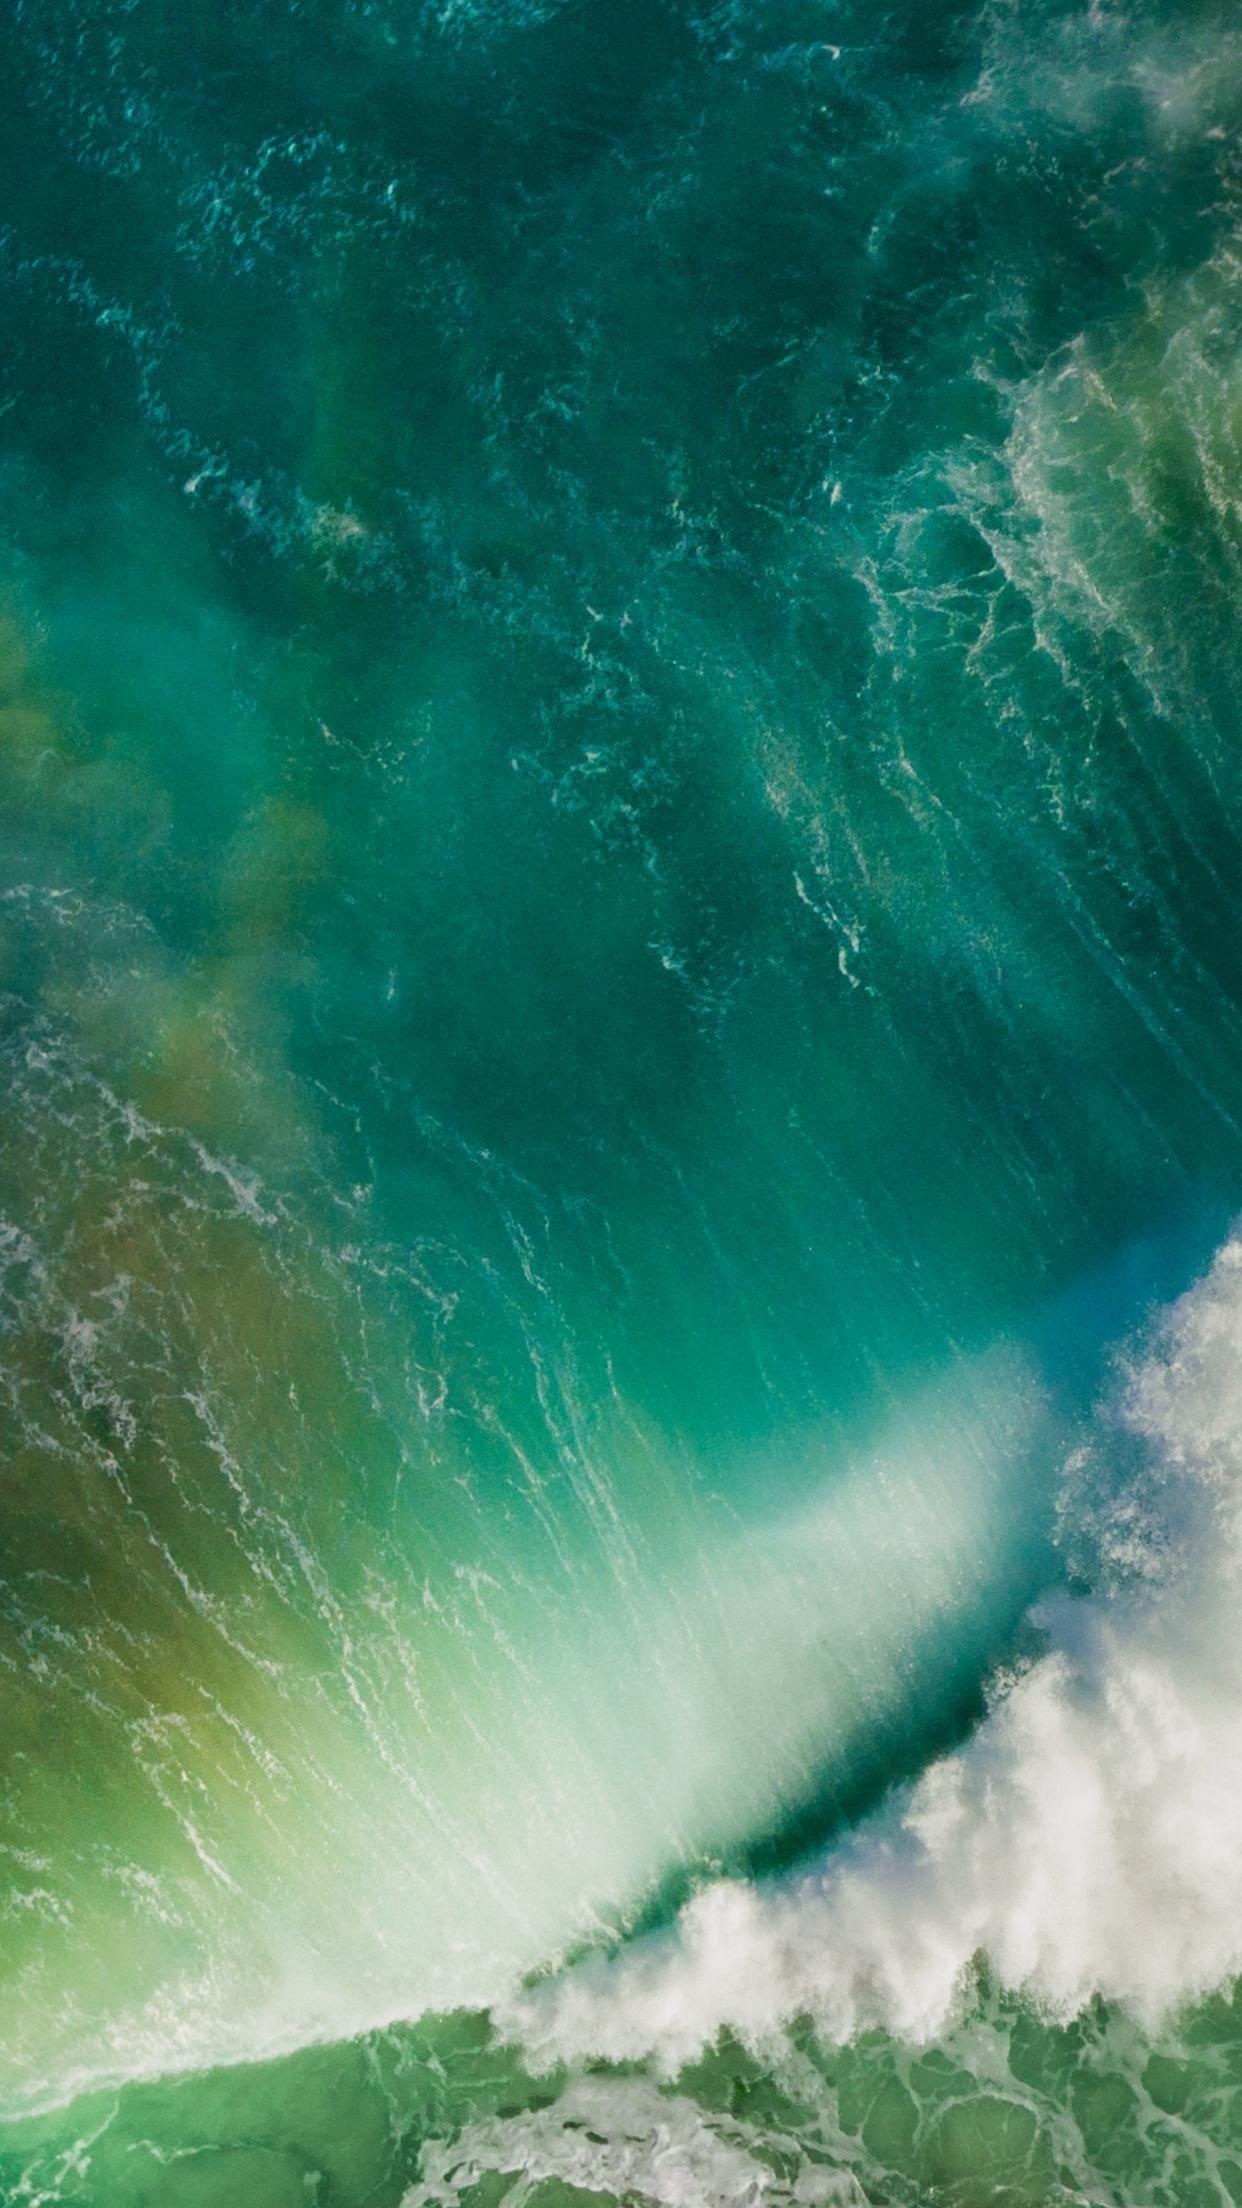 Fresh Iphone Waterfall Wallpaper 4k In 2020 Ios 11 Wallpaper Iphone Wallpaper Ios Ios 10 Wallpaper